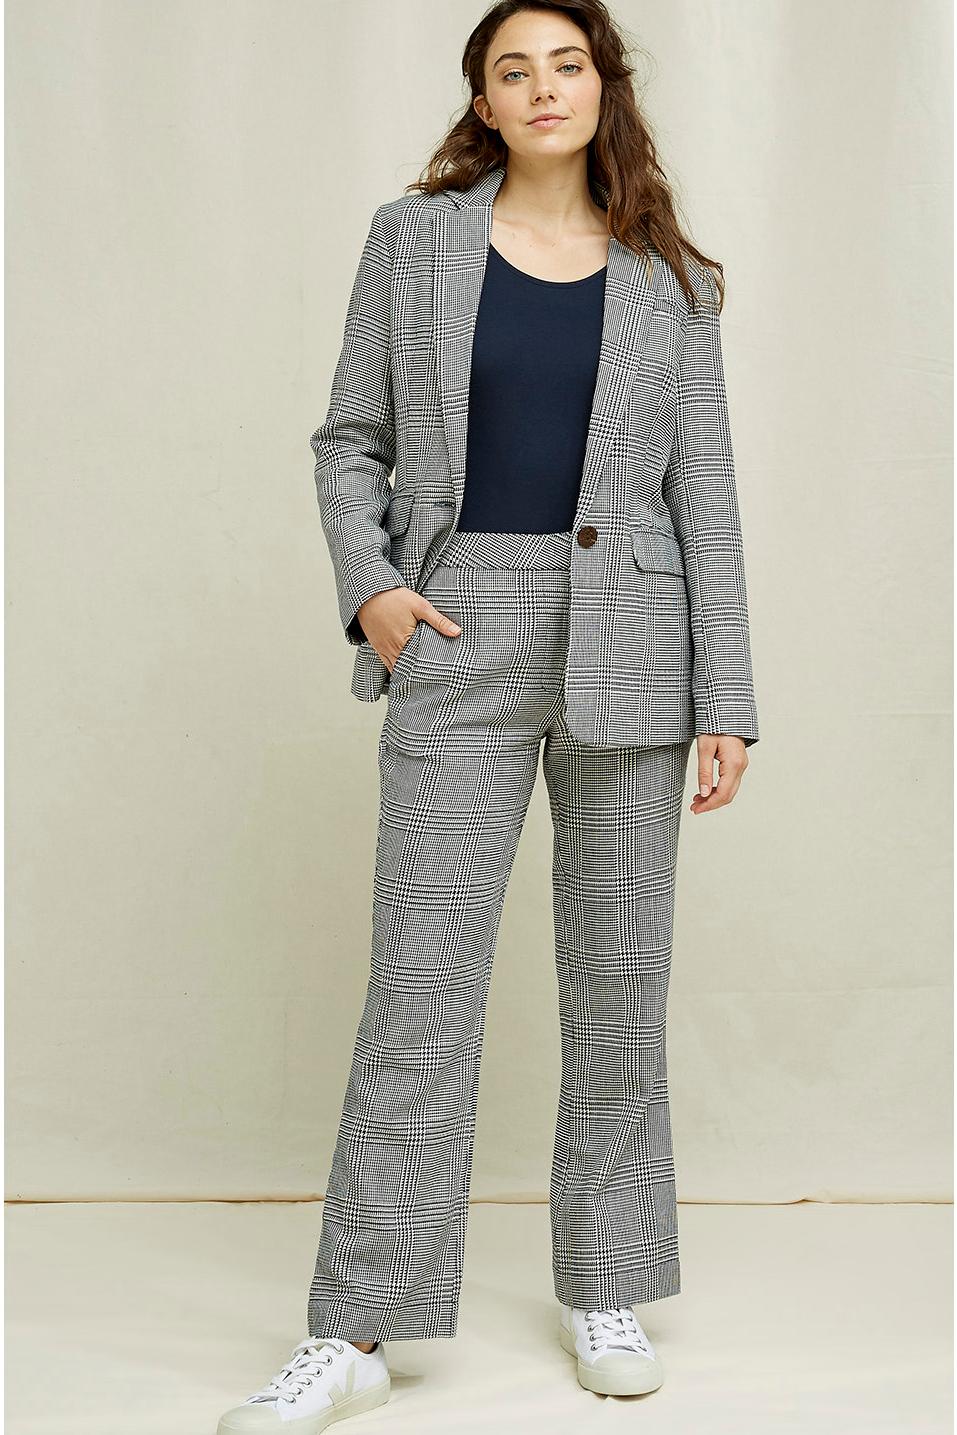 Roberta Organic Fashion Peopletree Blazer Mirren Checkered 5